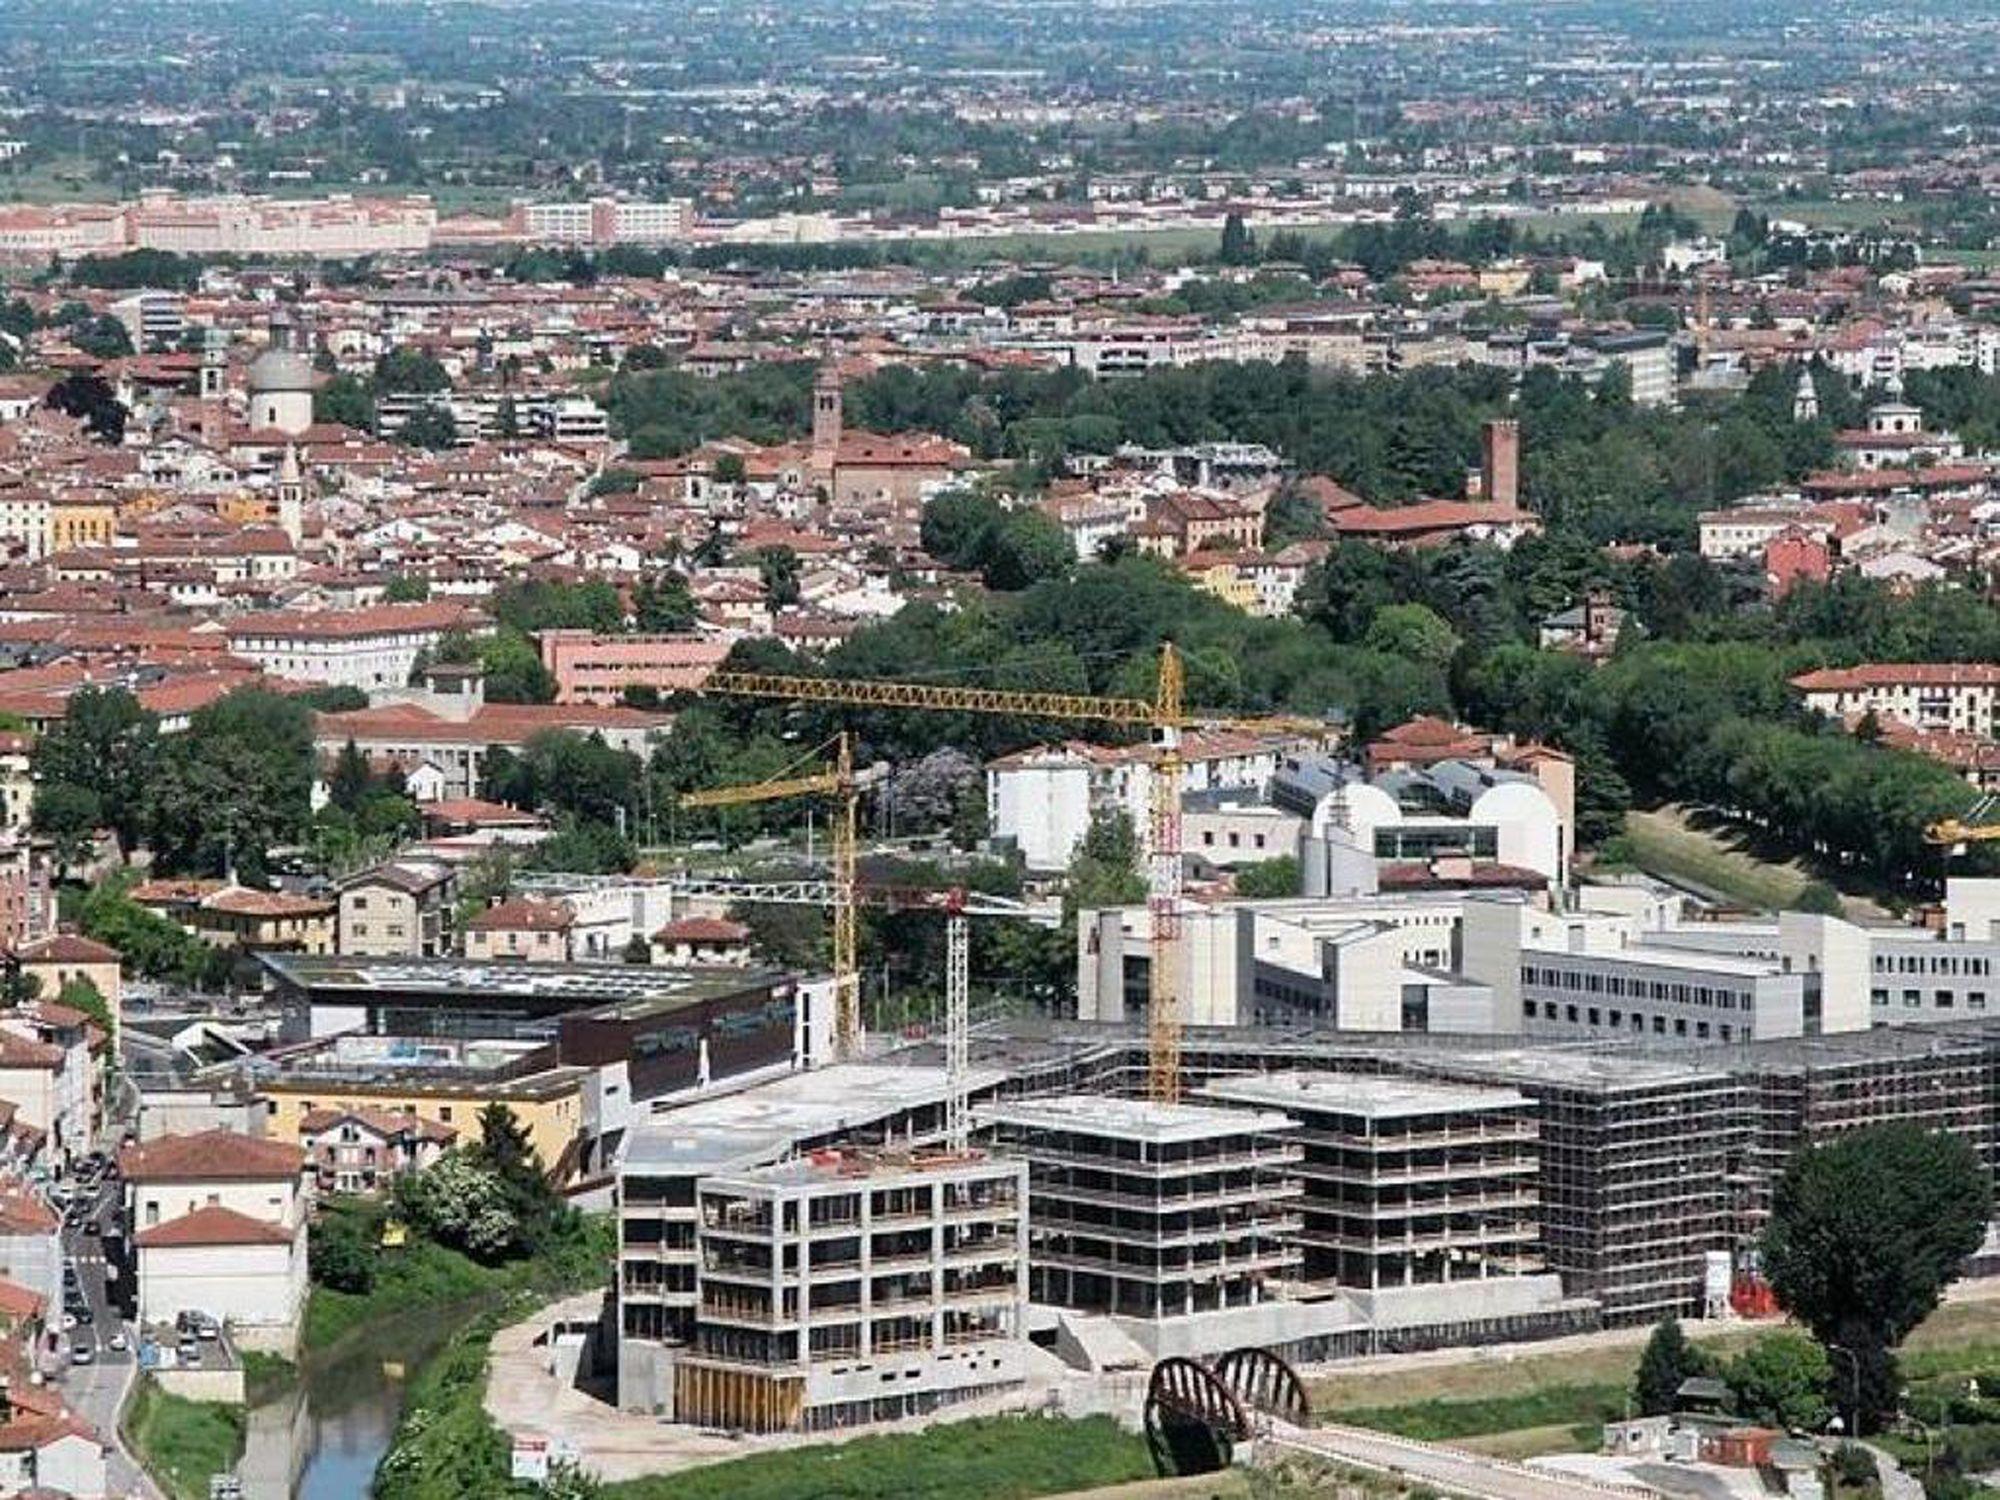 Borgo Berga